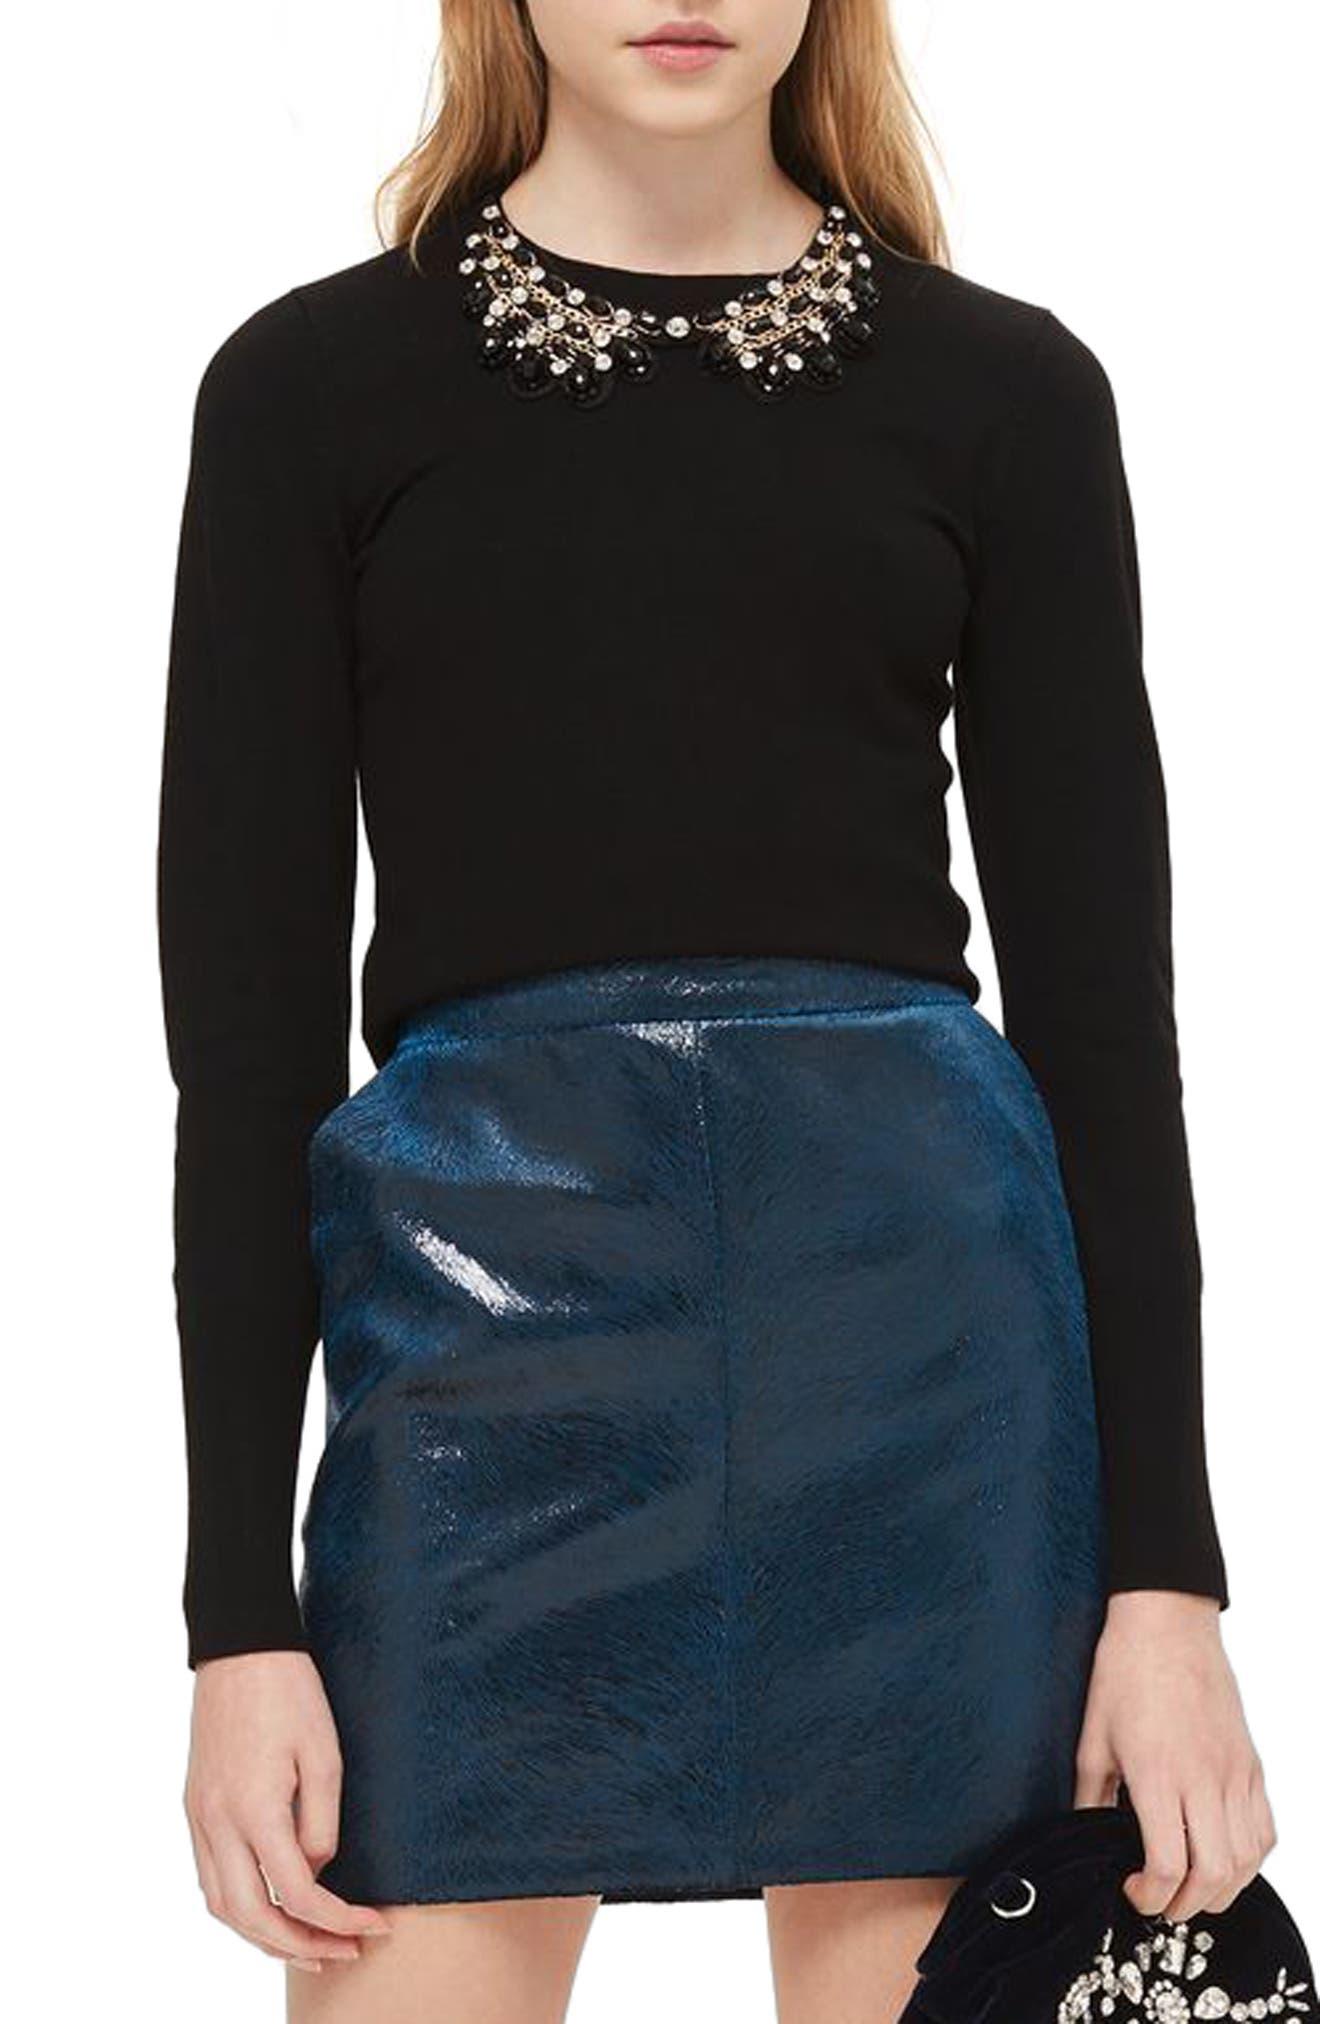 Topshop Embellished Collar Sweater